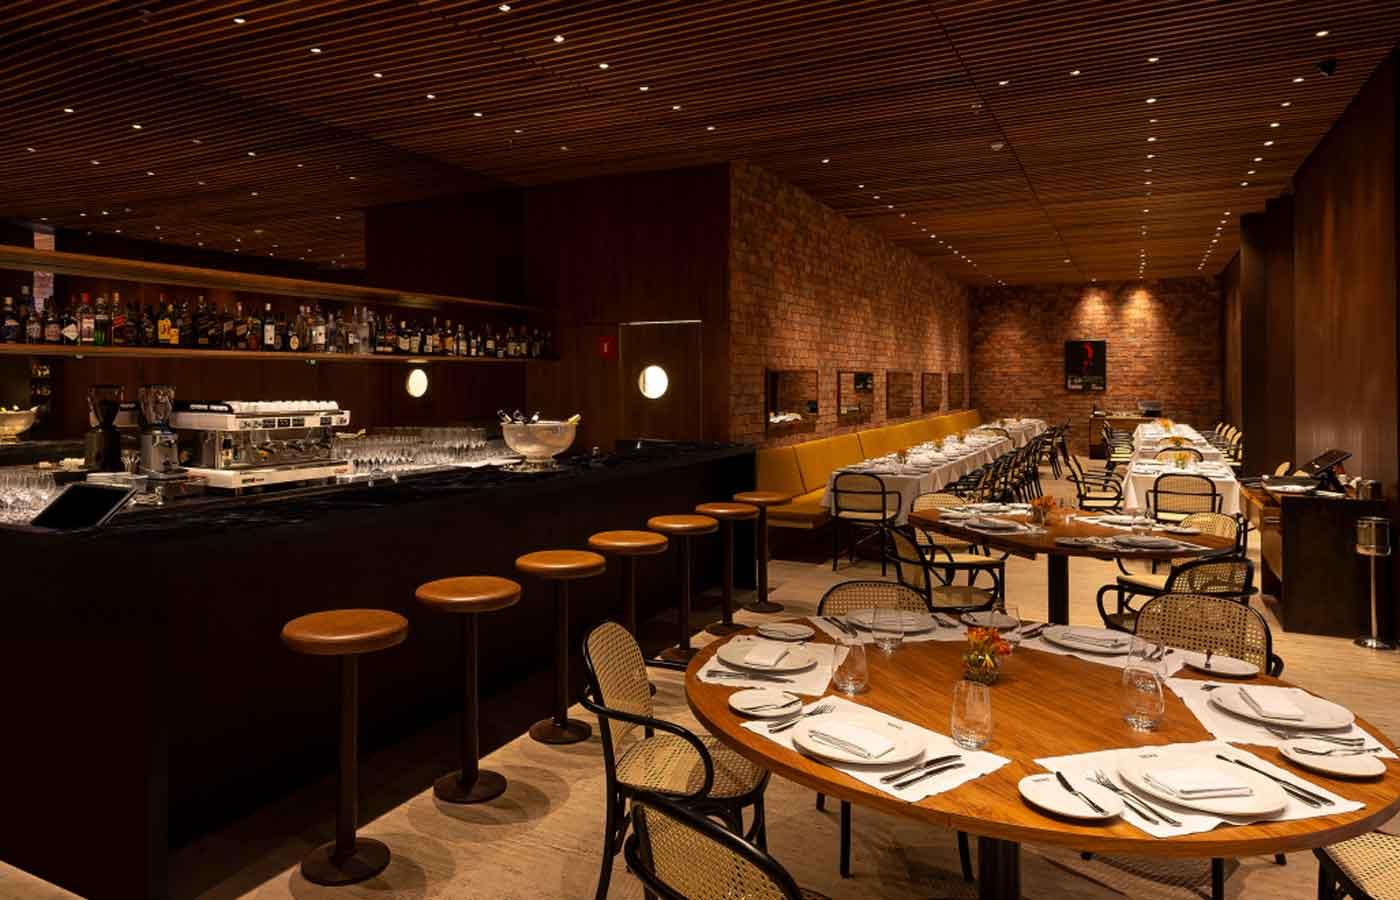 Hotel Fasano Belo Horizonte in Brazil, restaurant